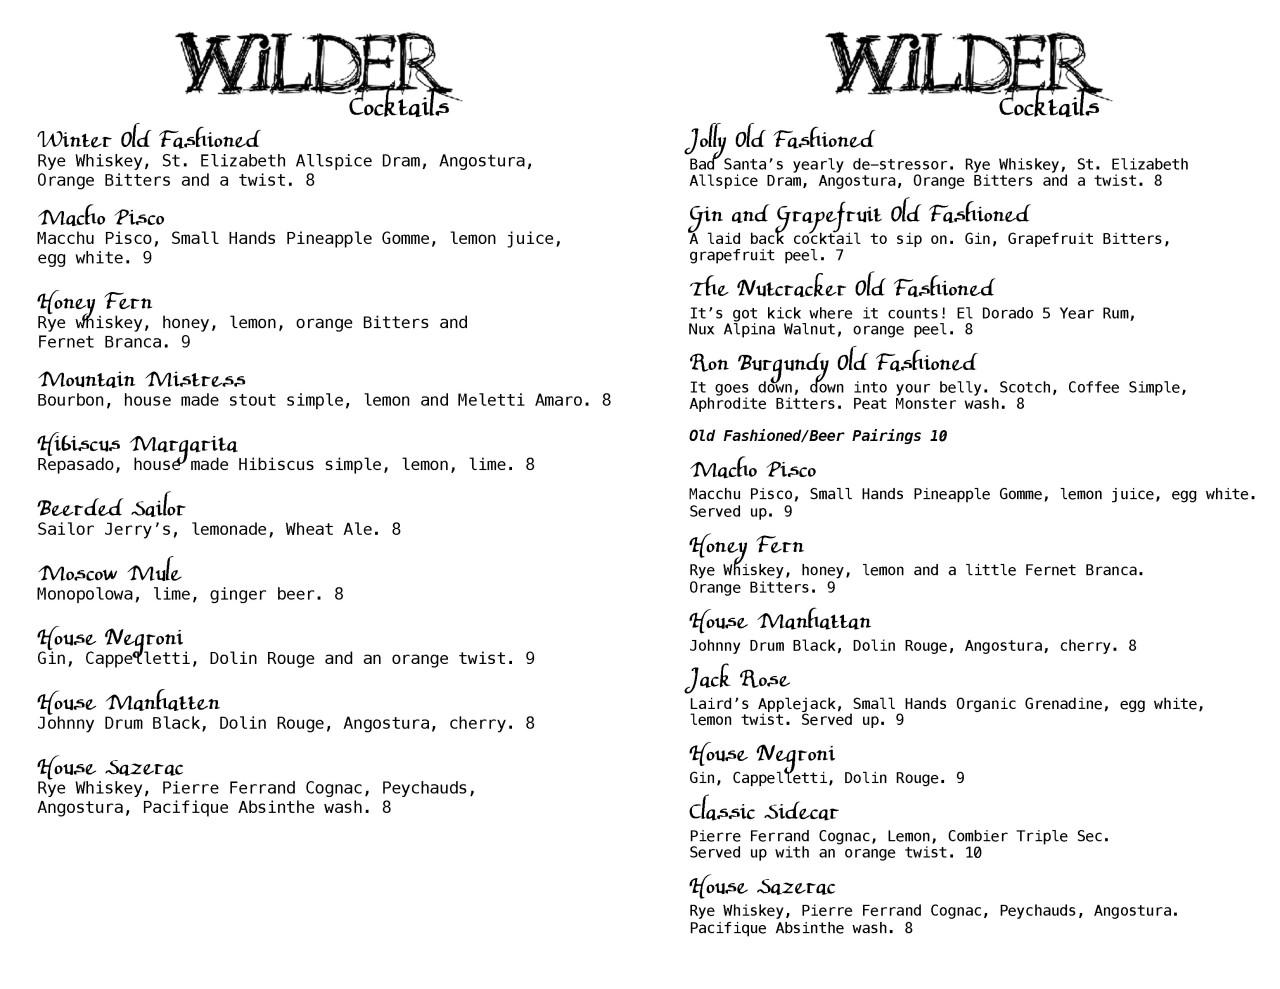 wilder_cocktails_small_no2